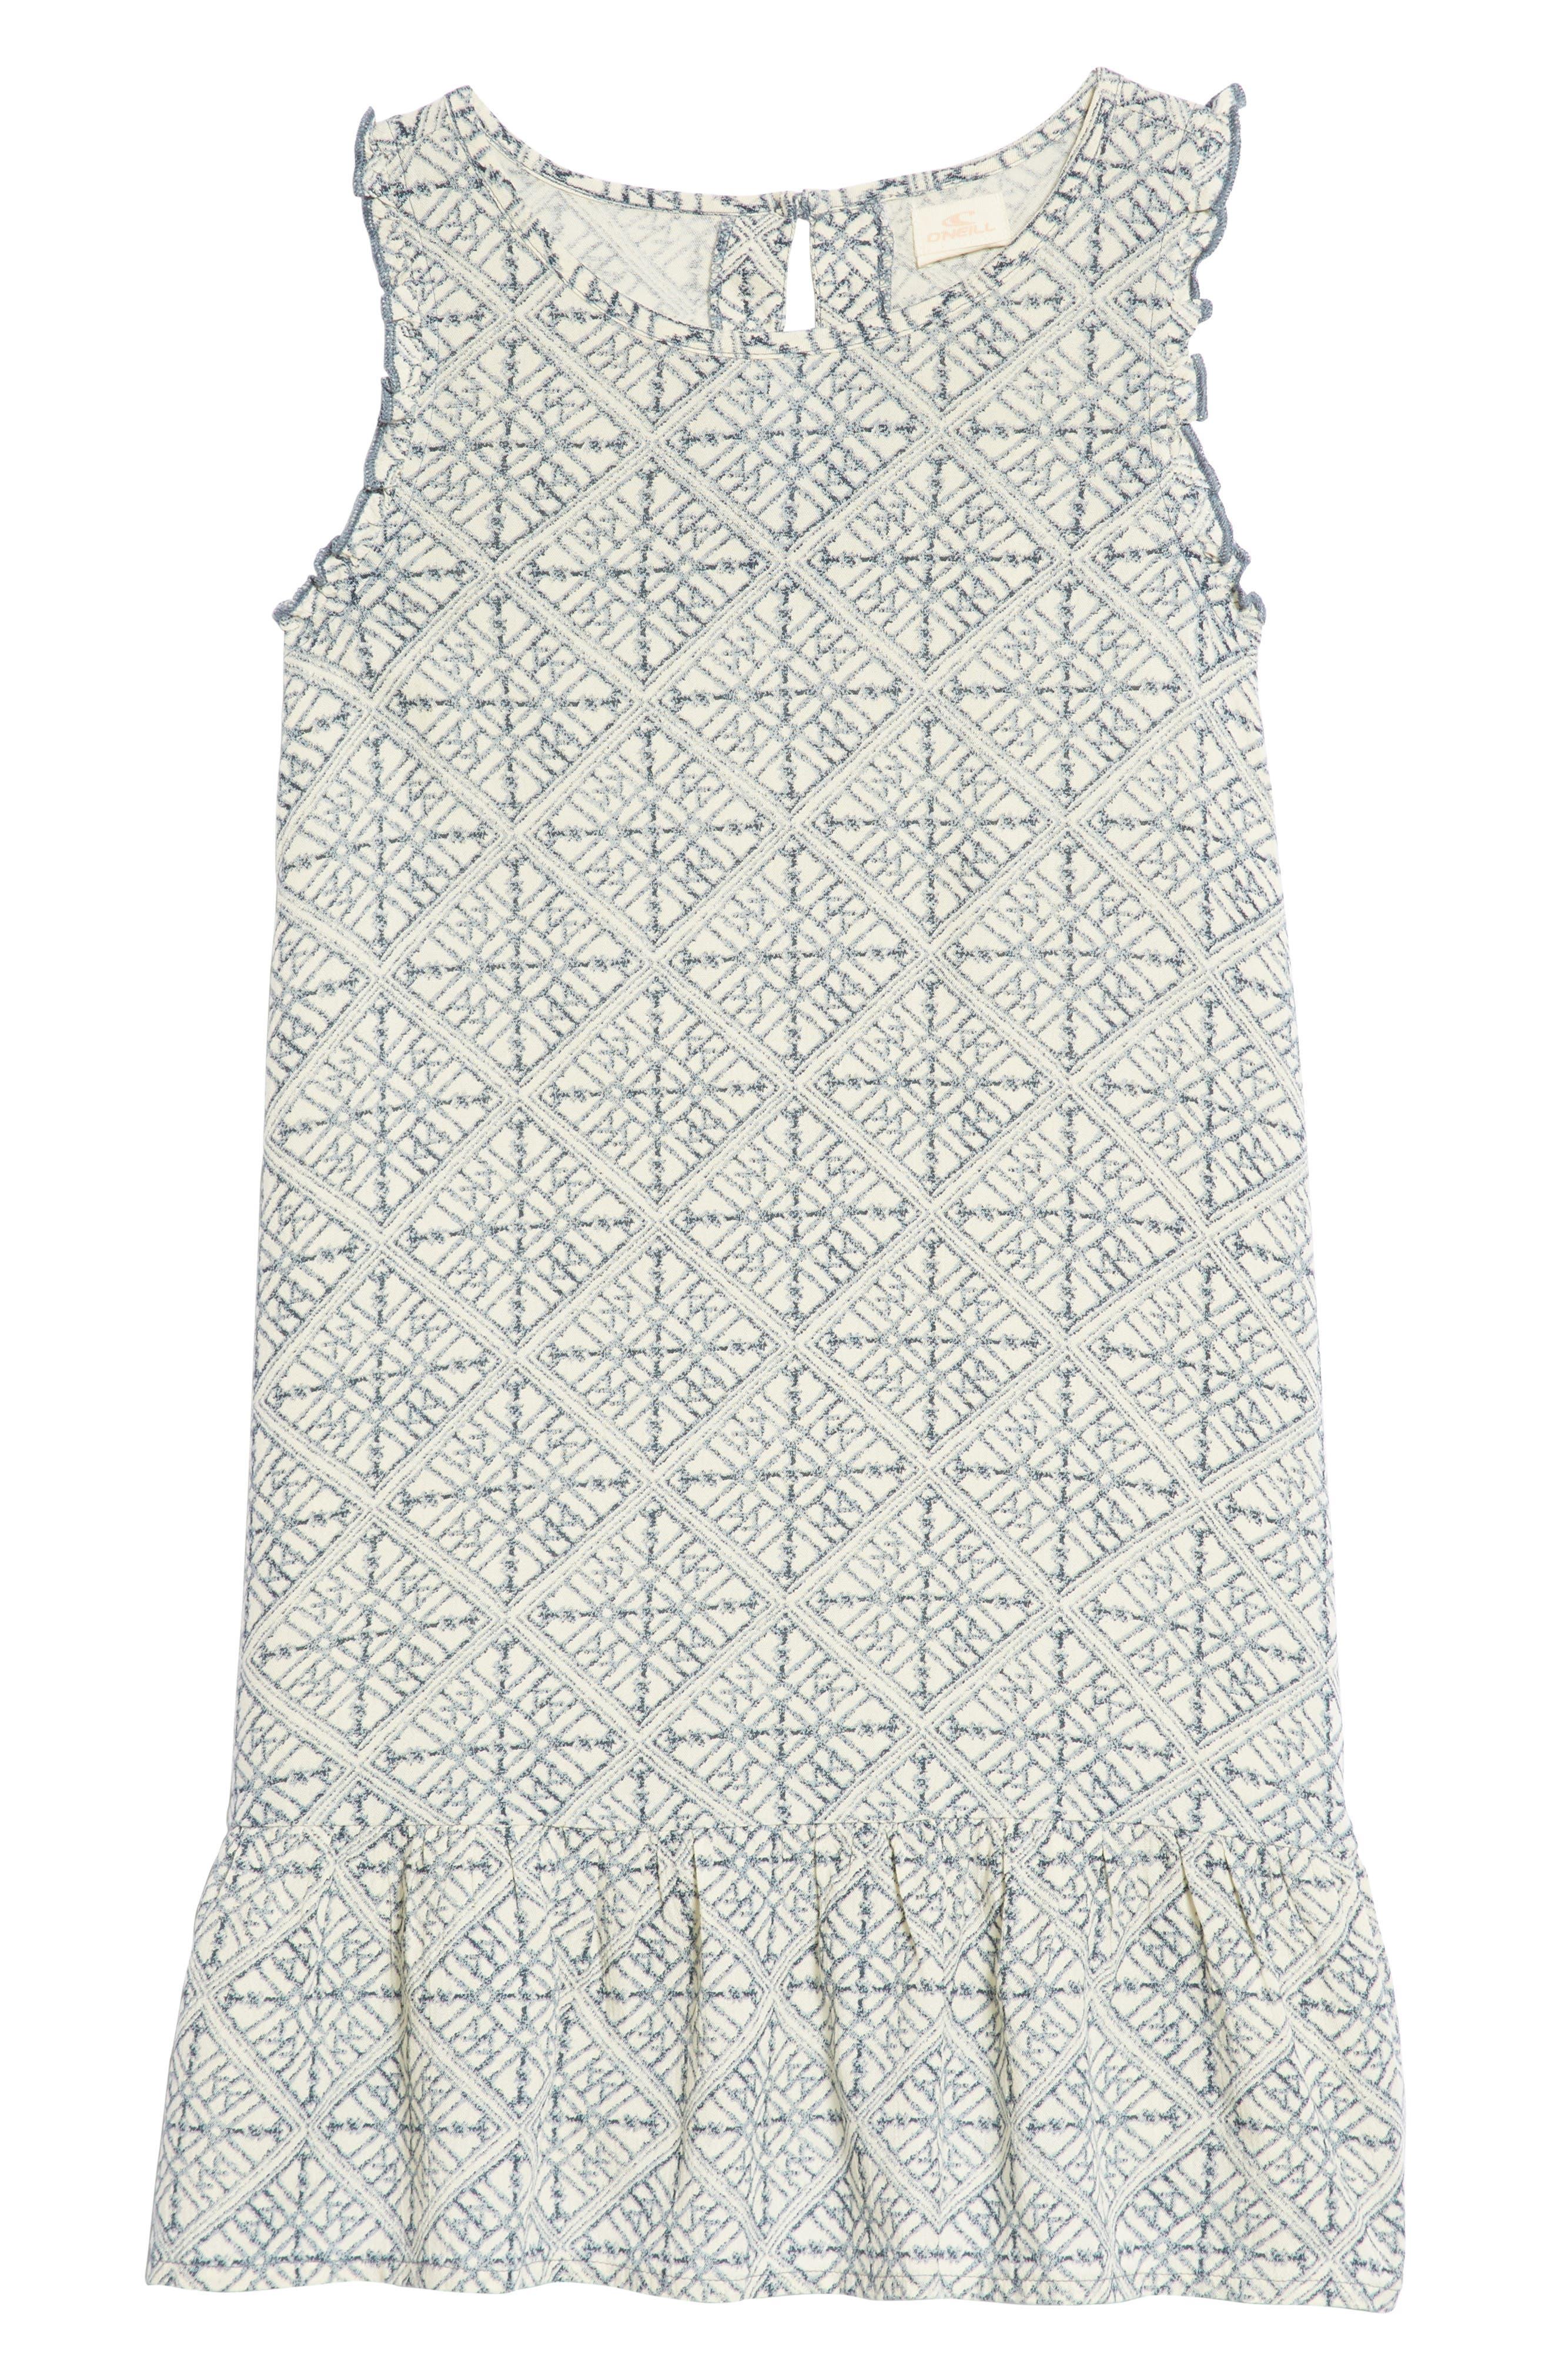 Lani Geo Print Shift Dress,                         Main,                         color, 423